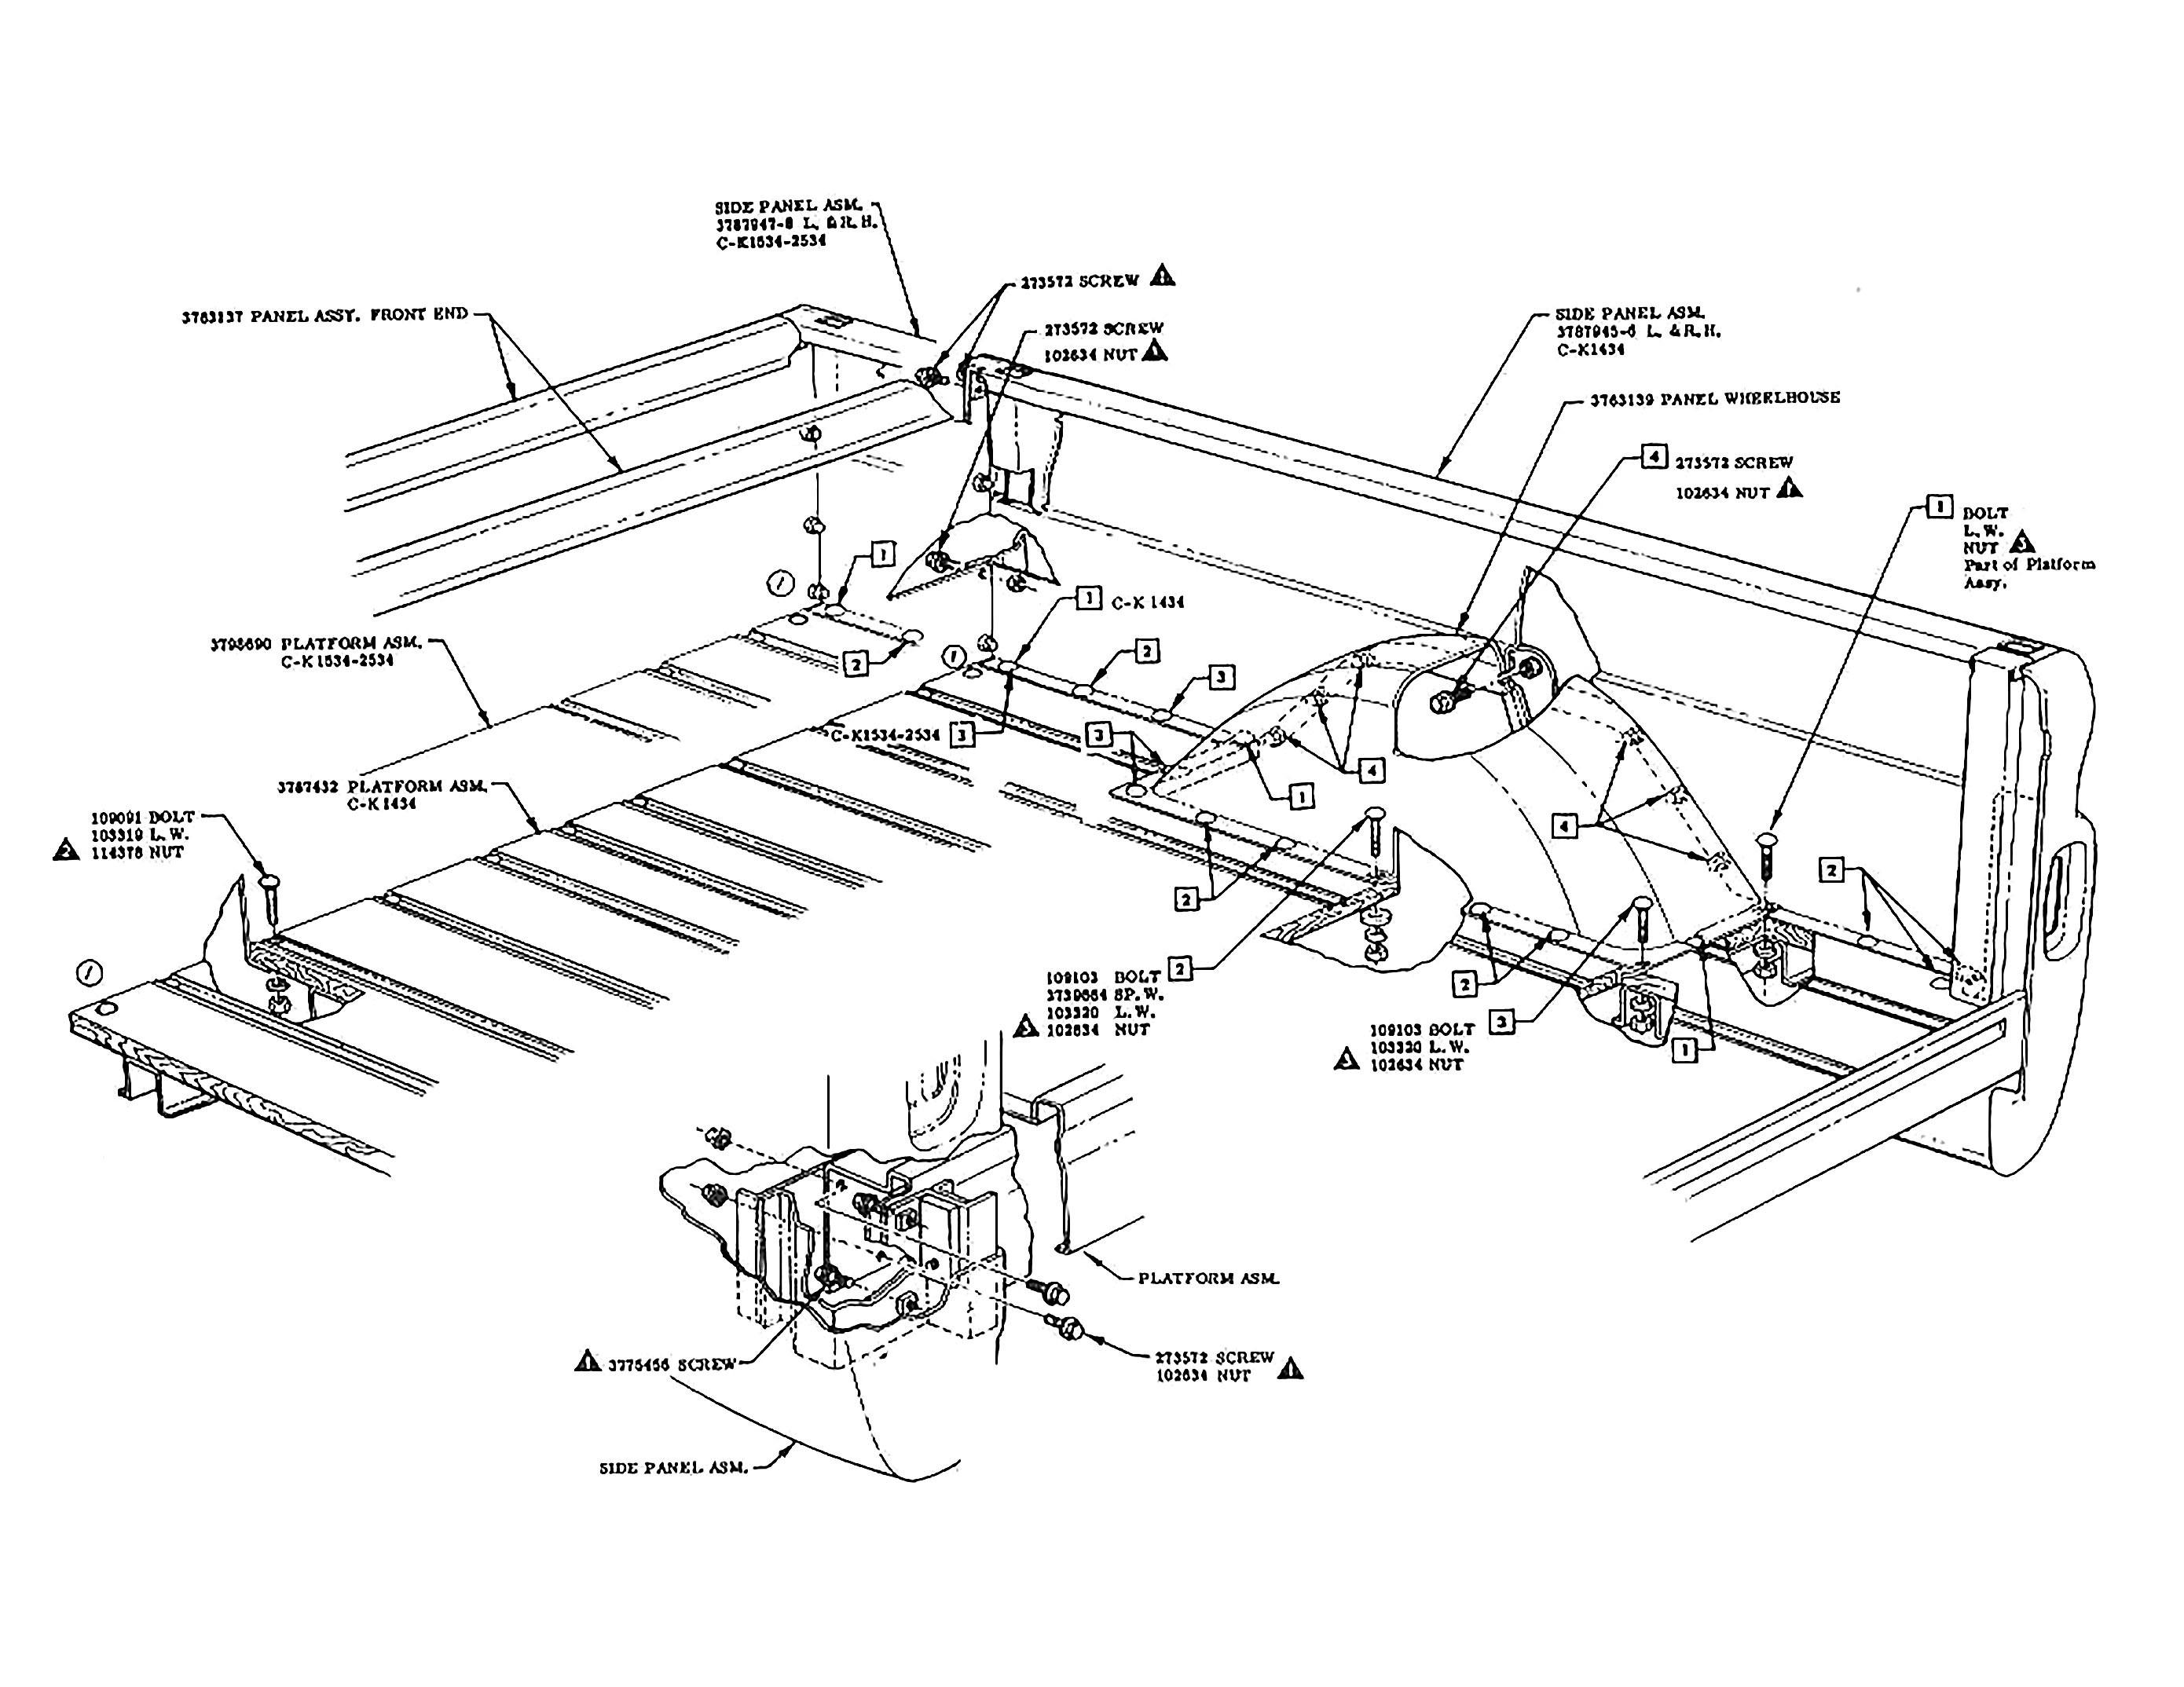 Seat Belt assembly Diagram Bed Fleetside Diagram 60s Chevy C10 Body & Misc Of Seat Belt assembly Diagram